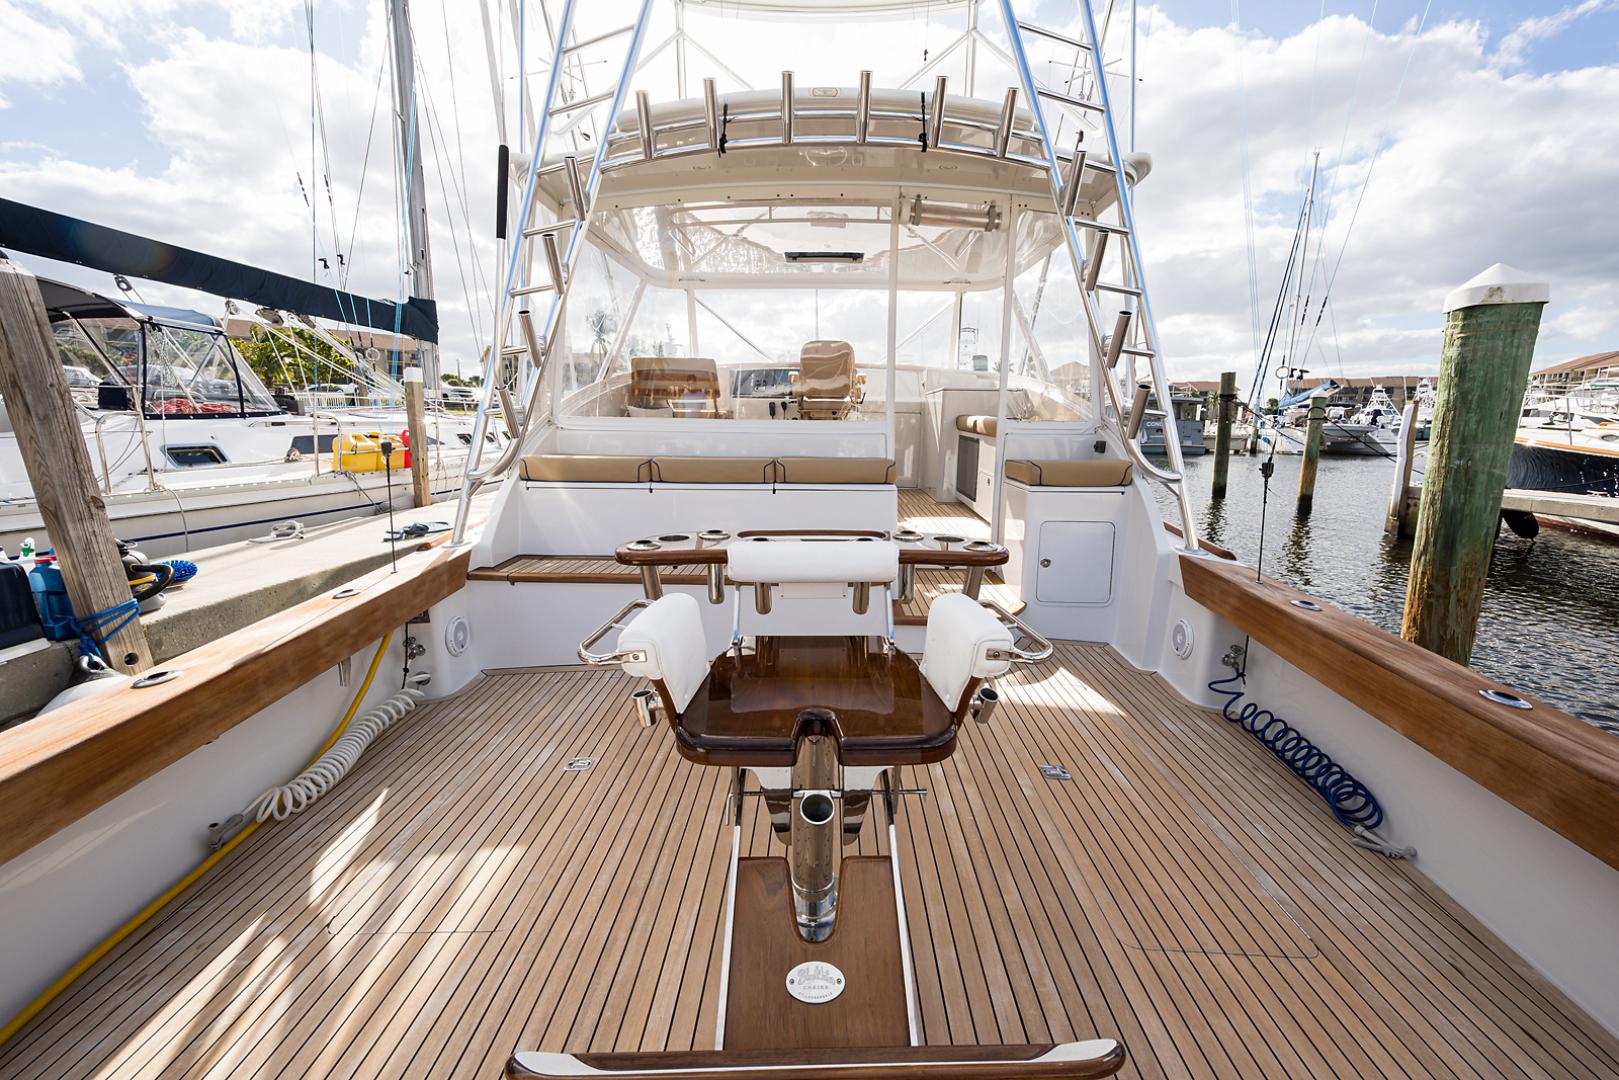 Release-One-of-A-Kind Custom Express 2014-Gladiator Jupiter-Florida-United States-Cockpit-1370107   Thumbnail